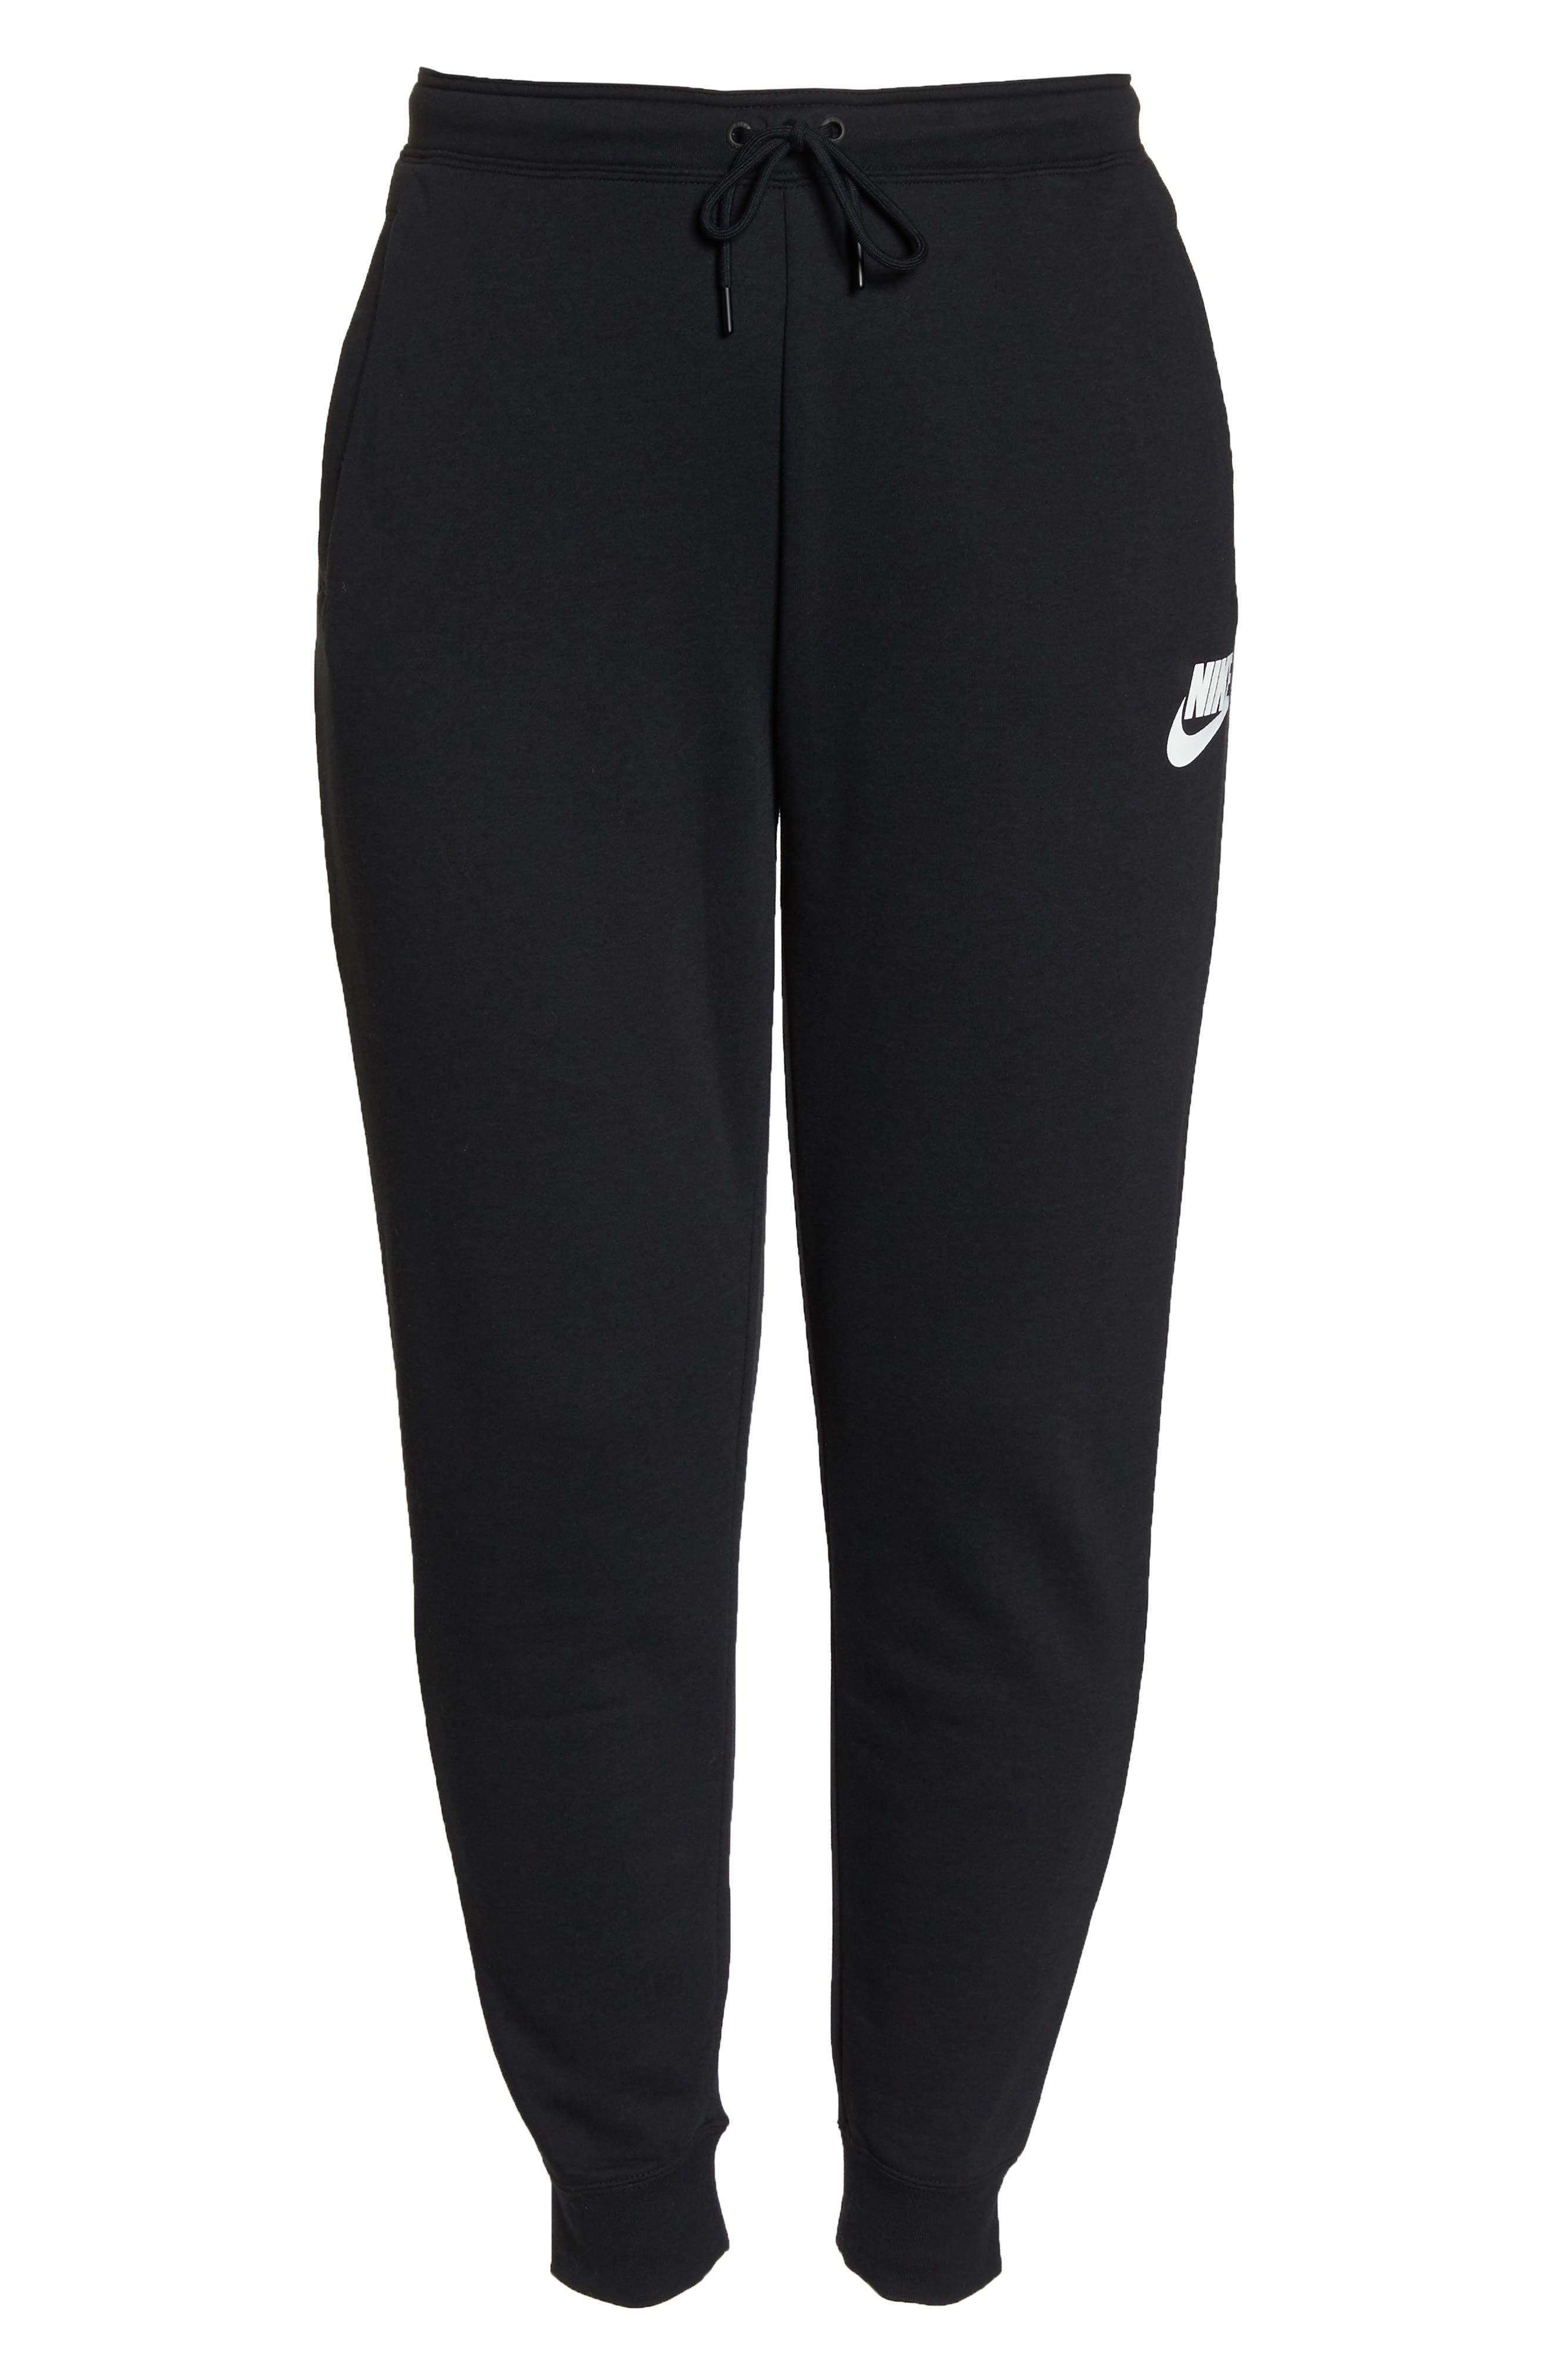 NIKE, Sportswear Rally High Rise Jogger Pants, Alternate thumbnail 7, color, BLACK/ BLACK/ WHITE